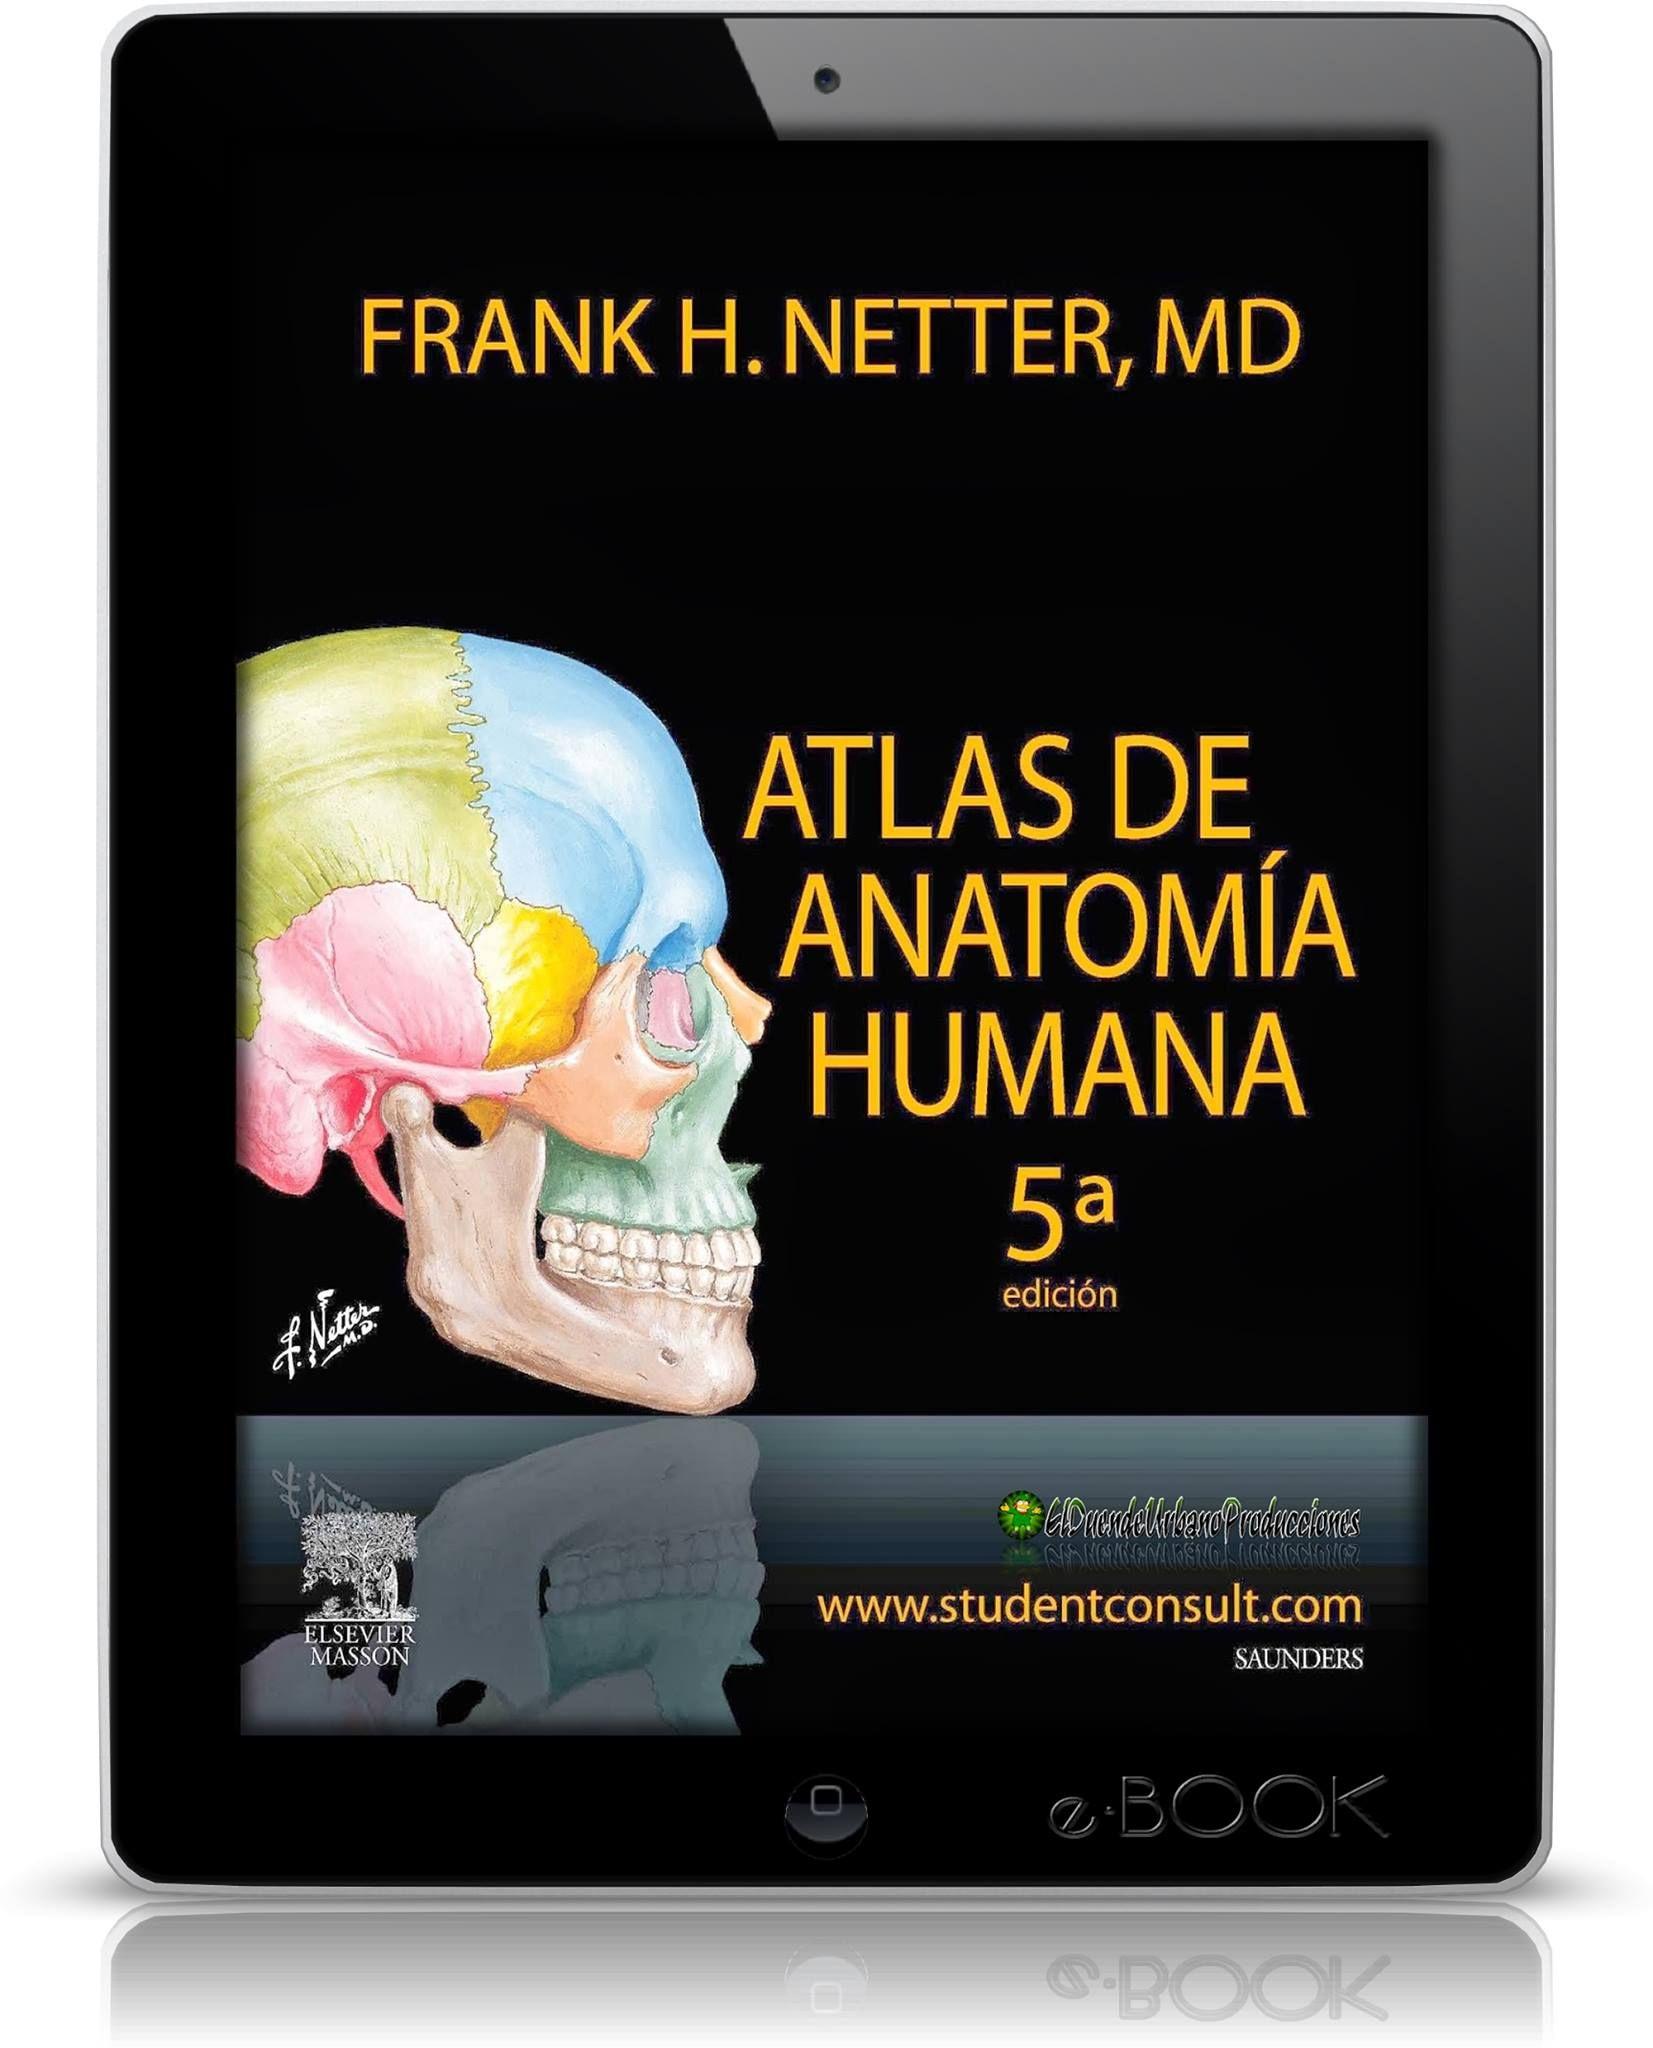 ATLAS DE ANATOMIA HUMANA l FRANK H. NETTER l 5TA. EDICION l LIBRO ...